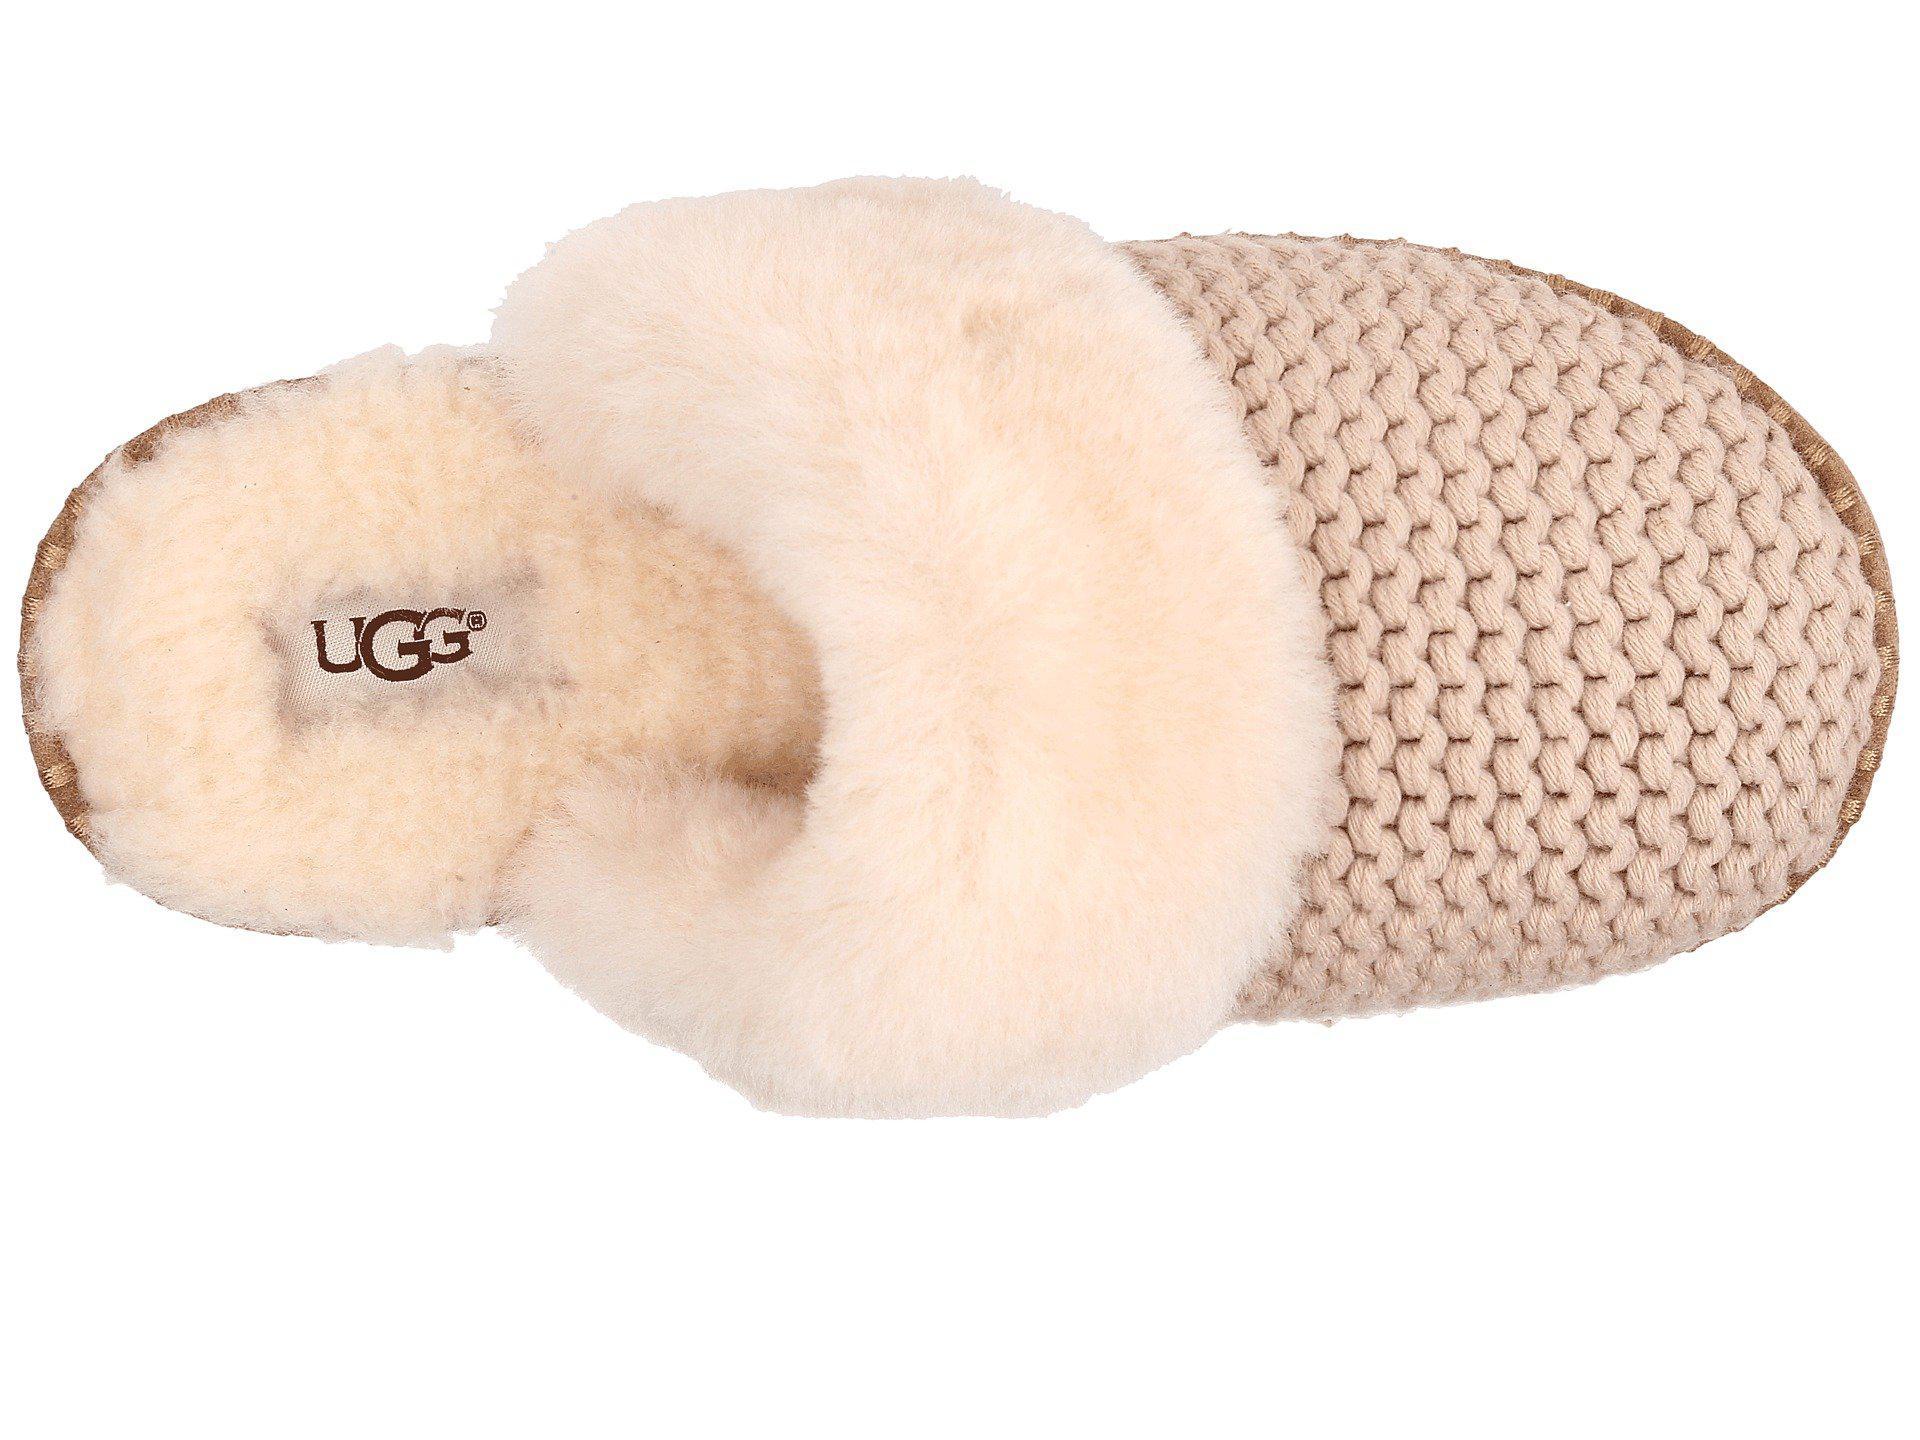 bb2f63af3b2 Lyst - Ugg Aira Knit (grey) Women s Slippers